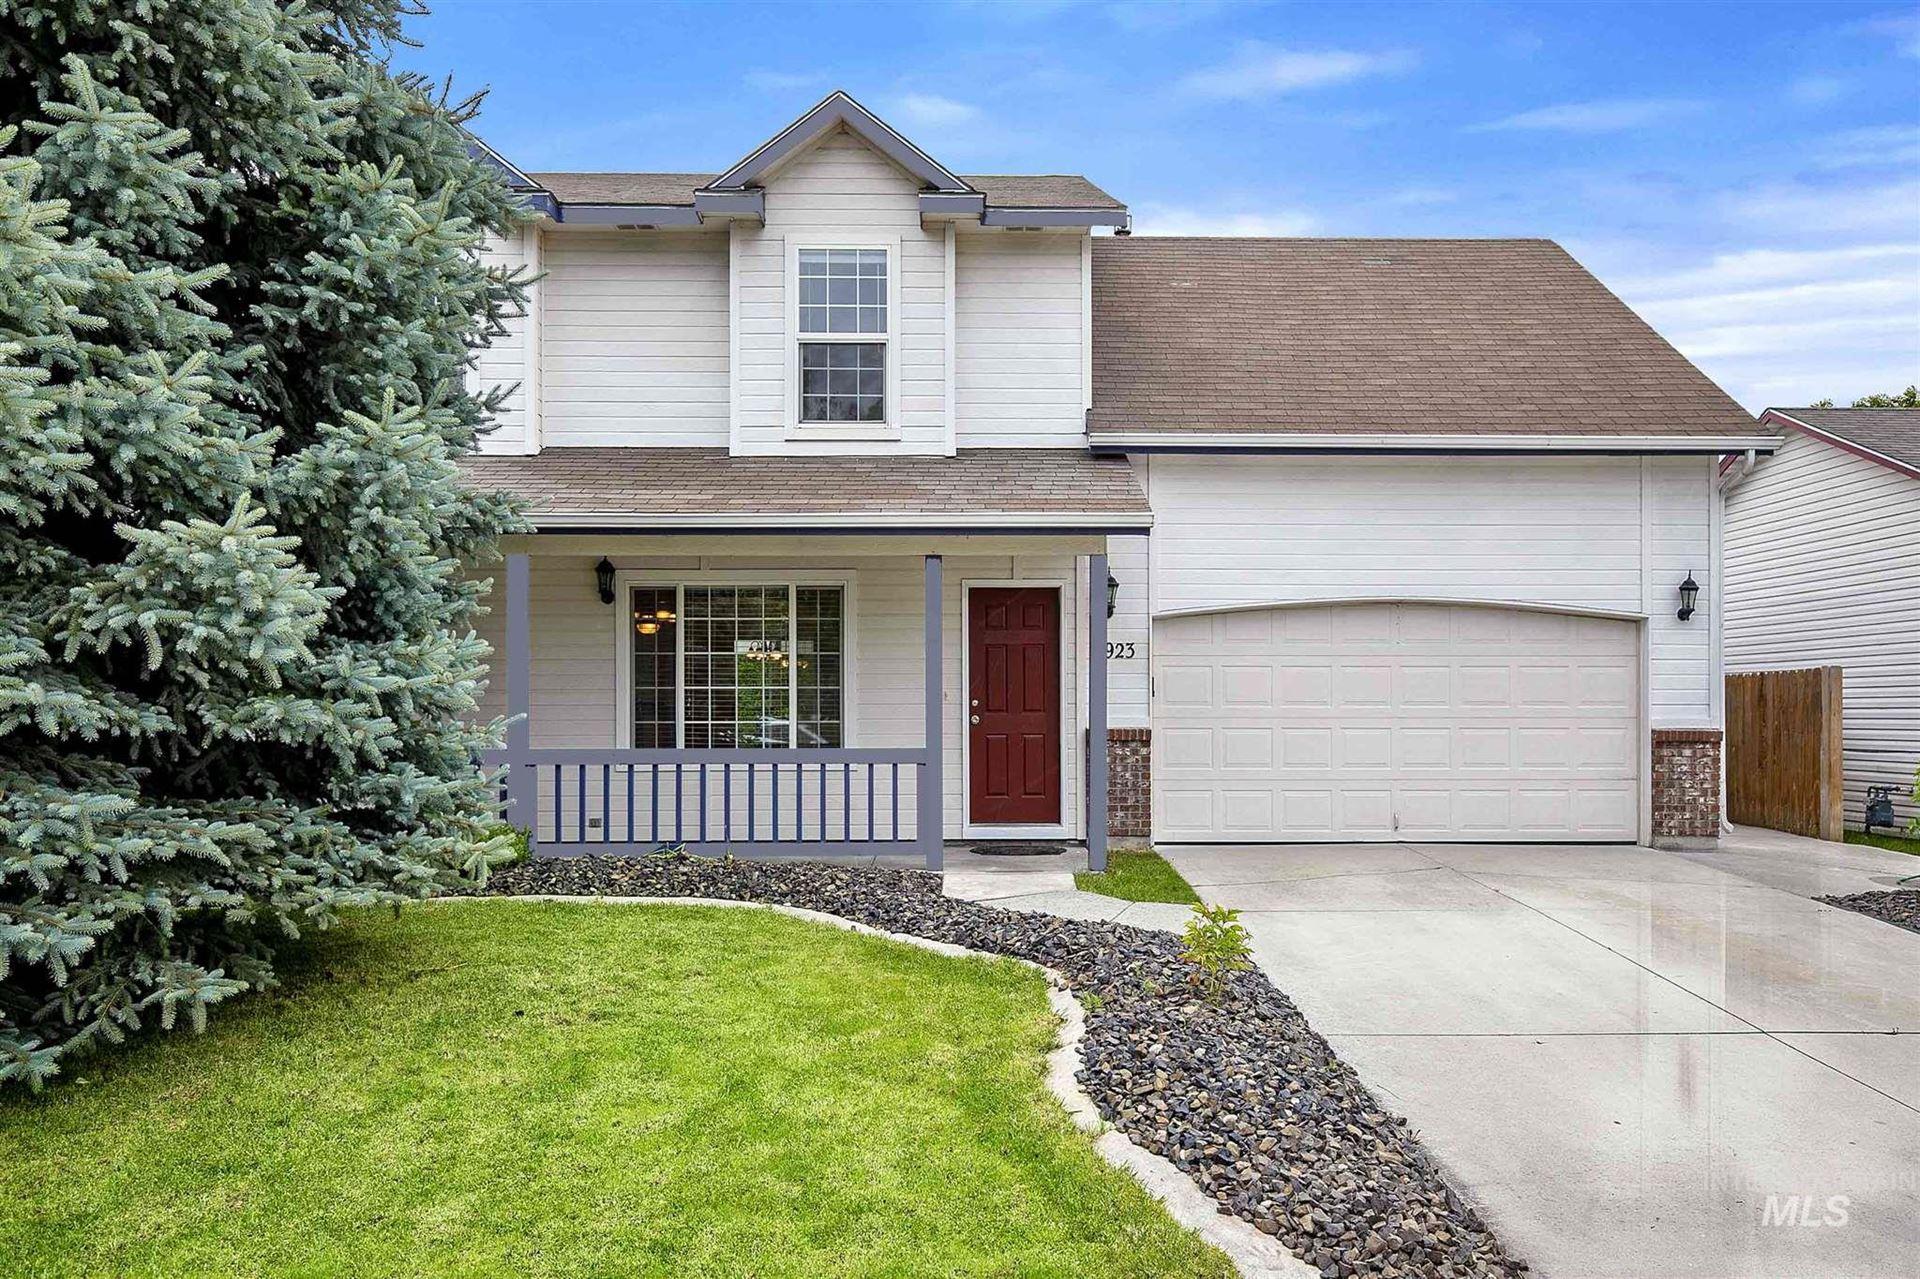 8923 W Tillamook Drive, Boise, ID 83709 - #: 98770989